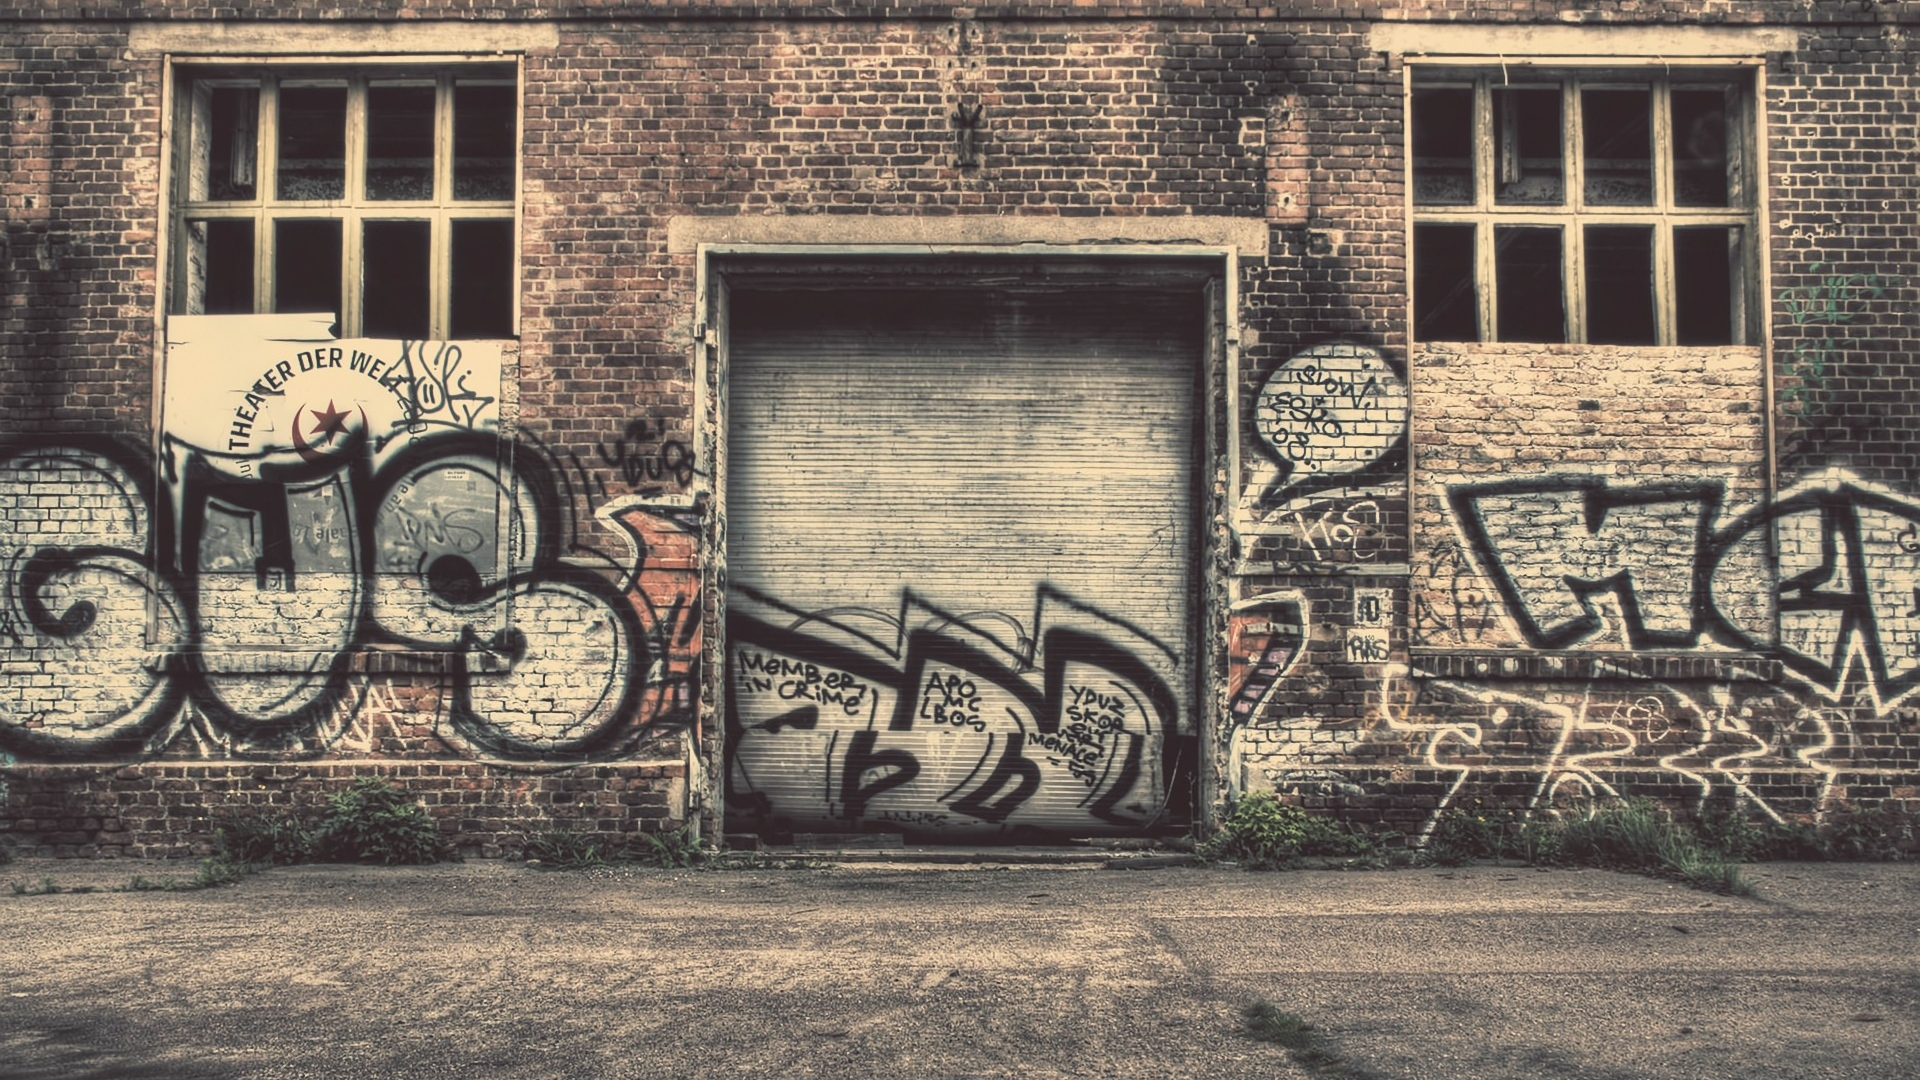 HD Background City Graffiti Wall Drawing Art Old Street Wallpaper 1920x1080